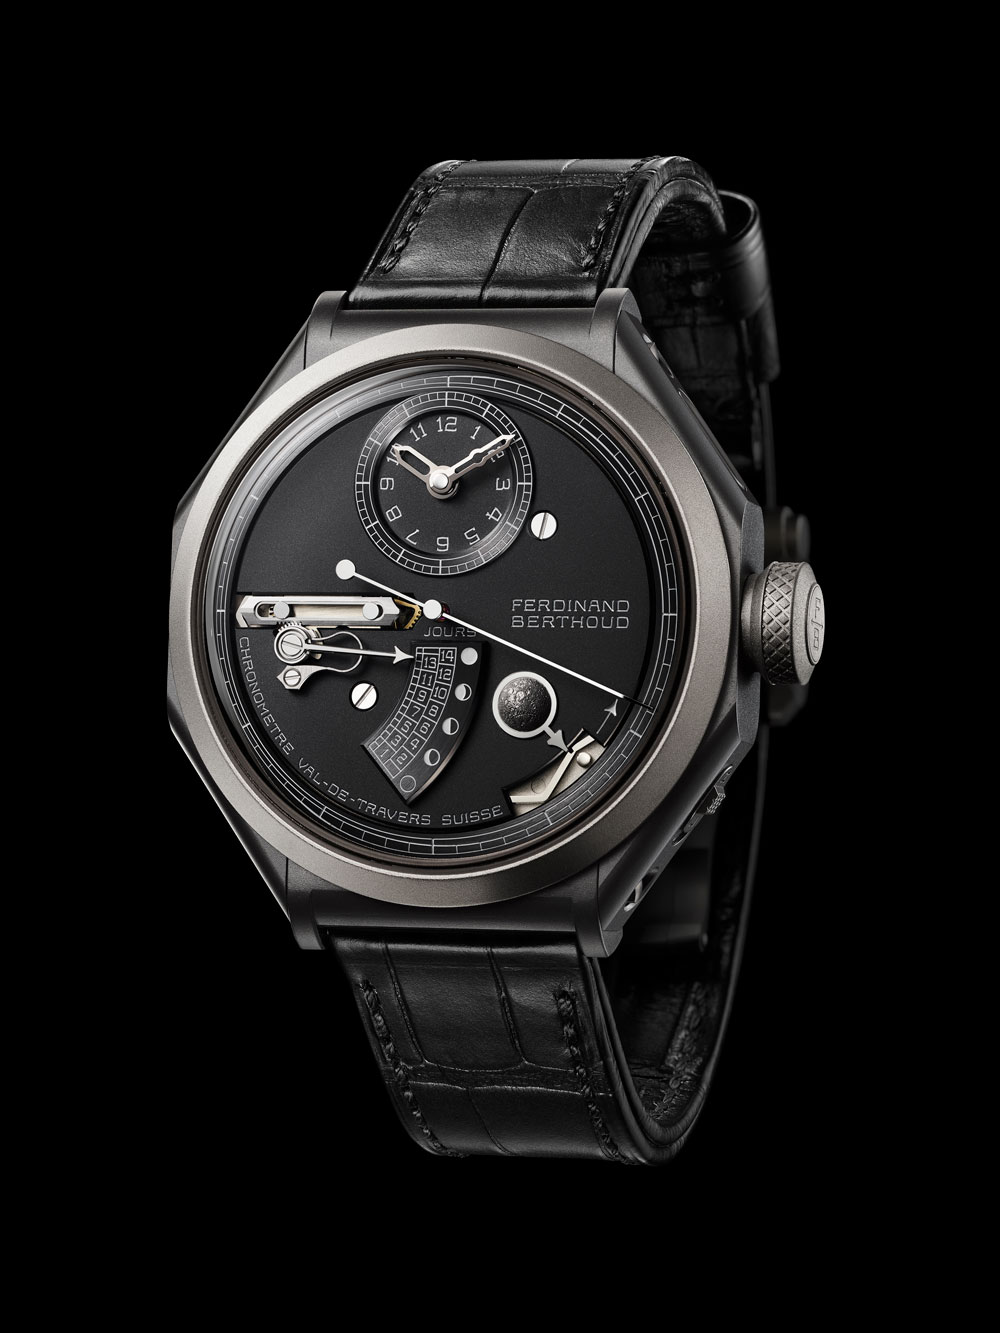 Reloj Chronomètre FB 1 L de la manufactura relojra suiza La Chronomètrie Ferdinand Berthoud